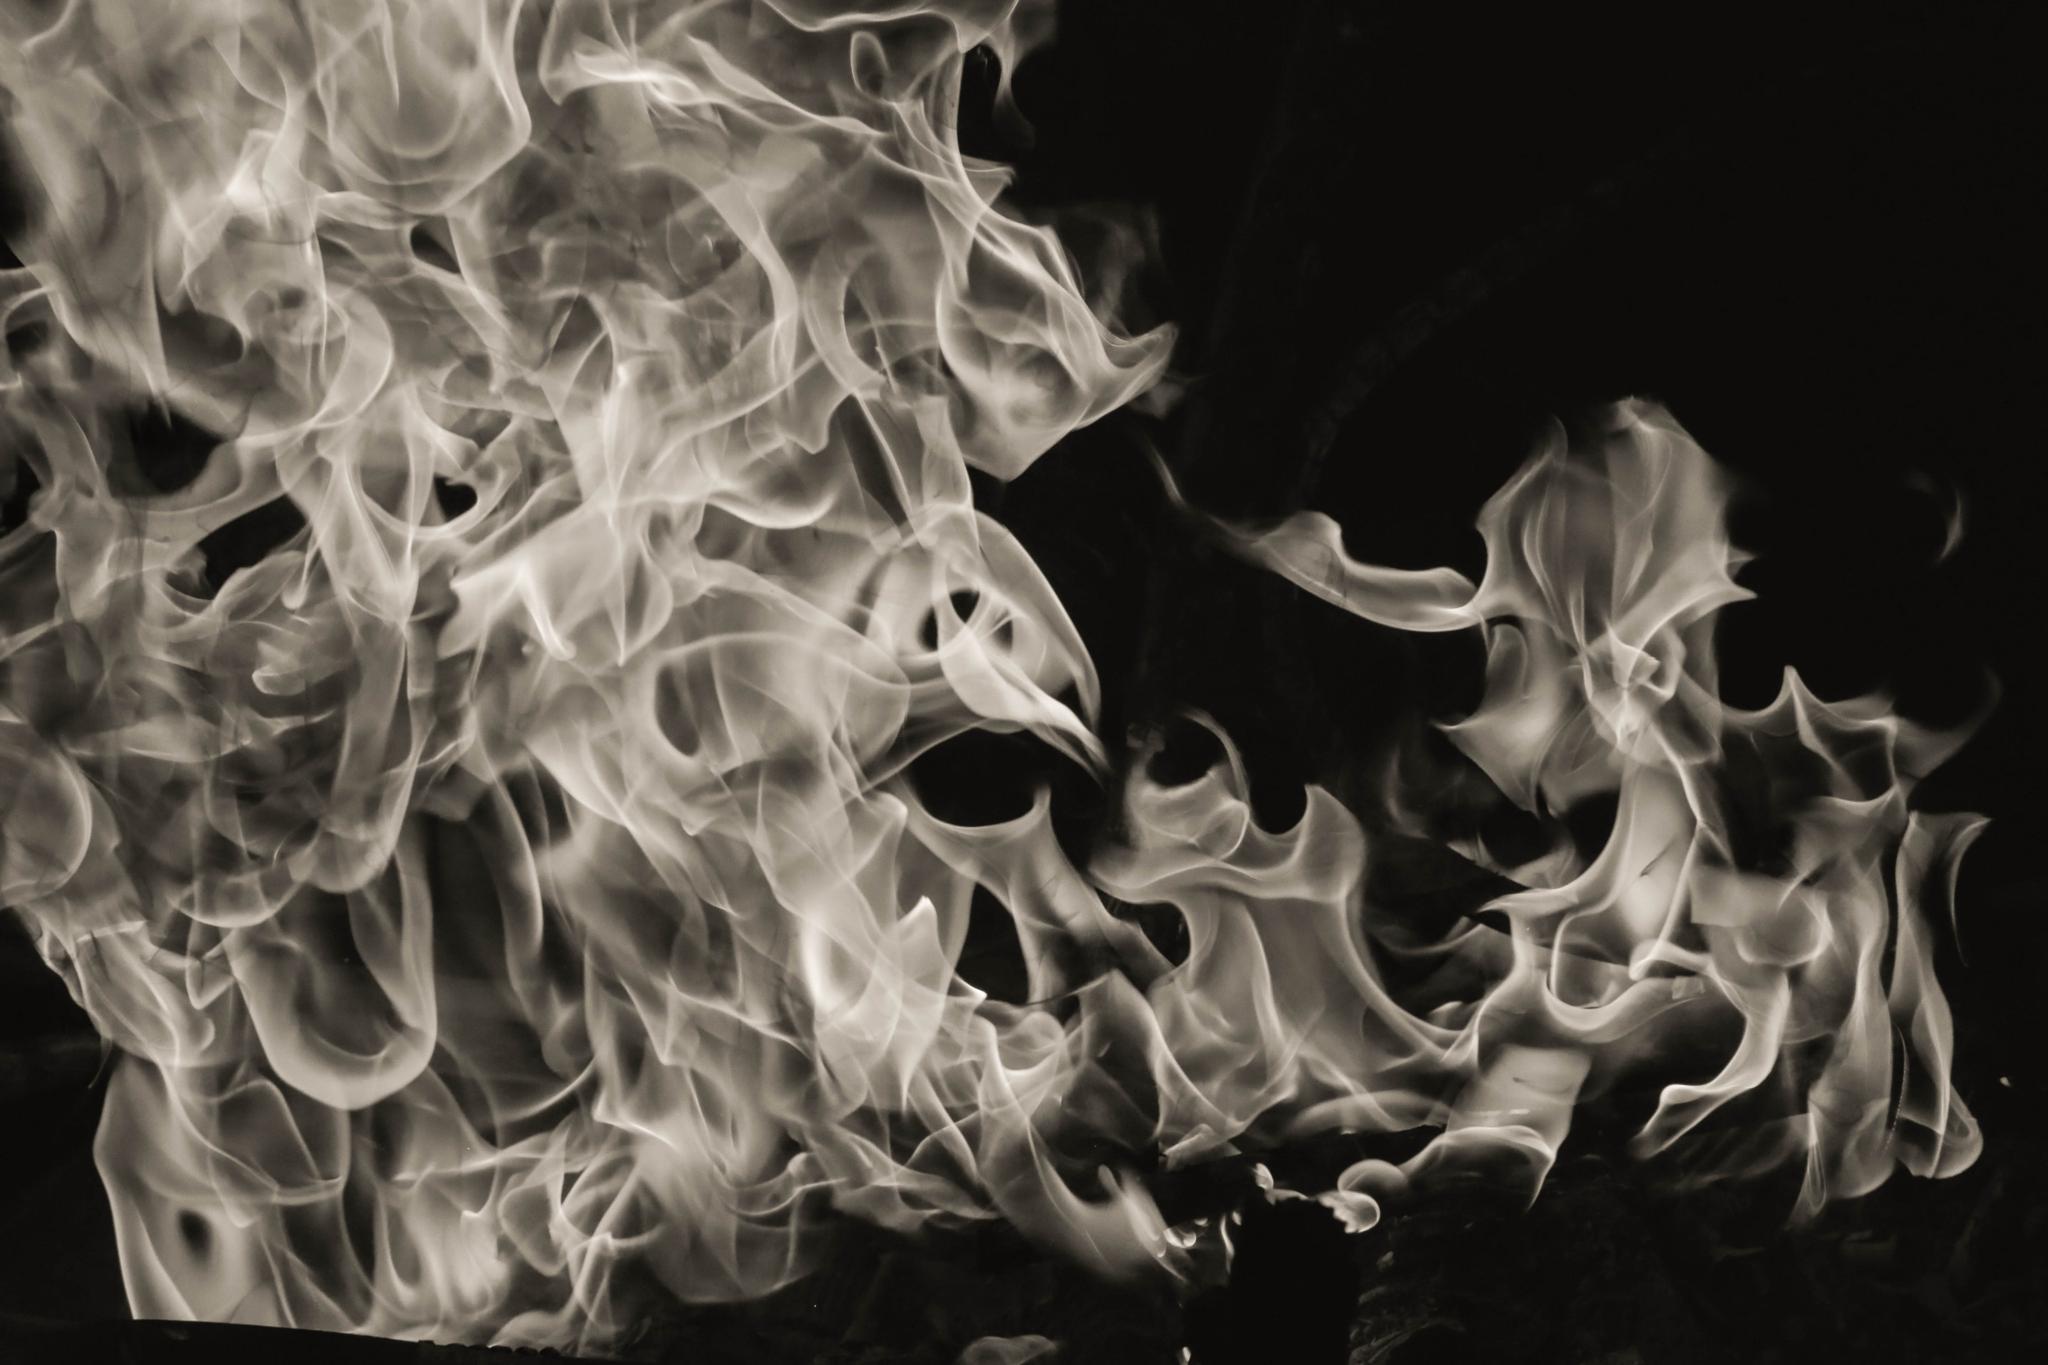 The Burn by CareyCarter